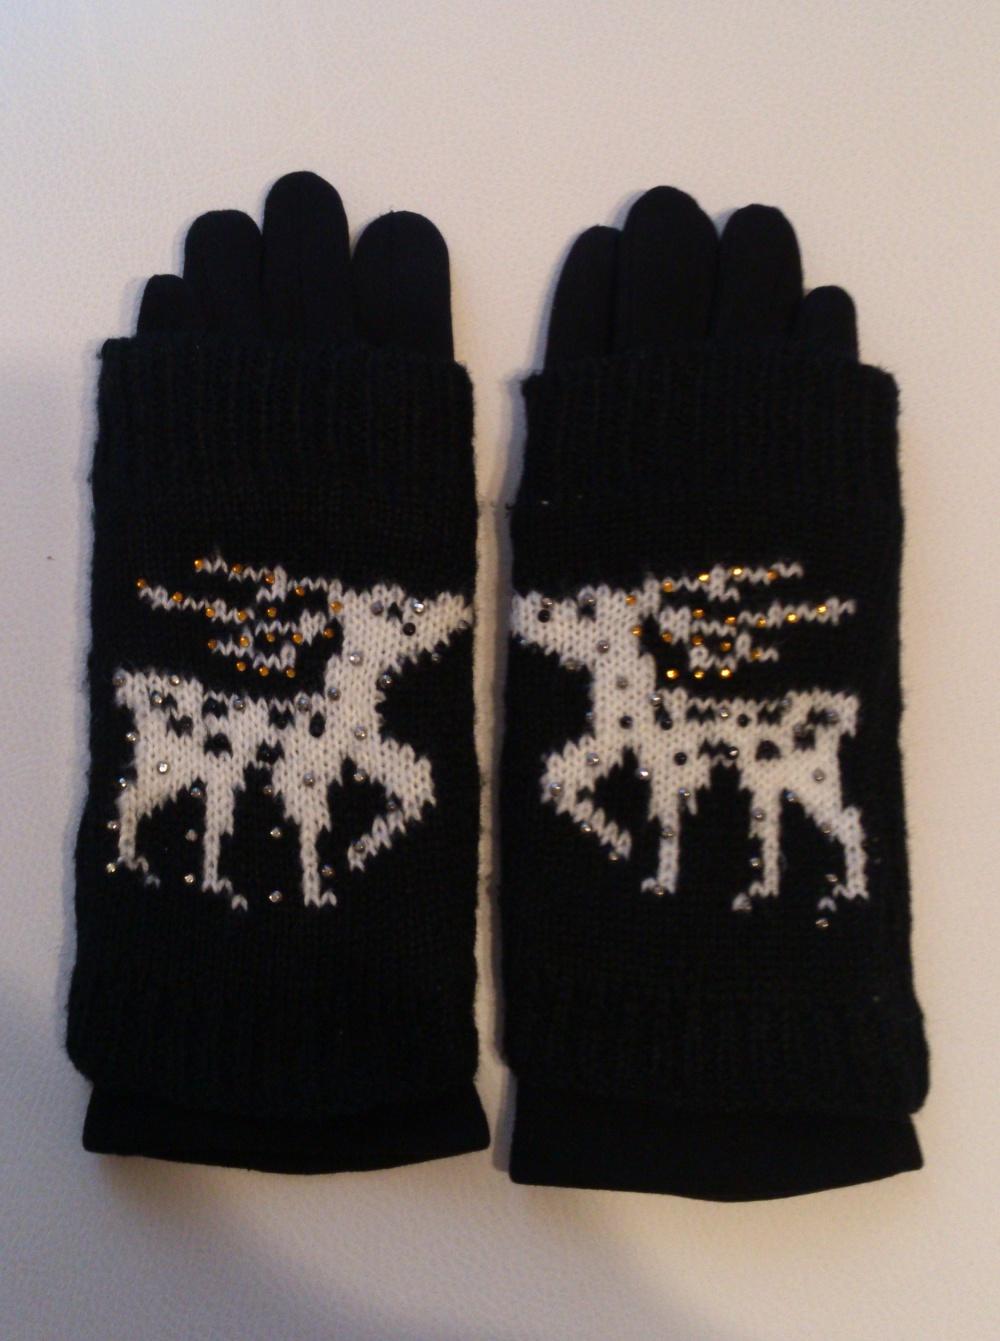 Комплект:  митенки и перчатки , размер 7 или 8